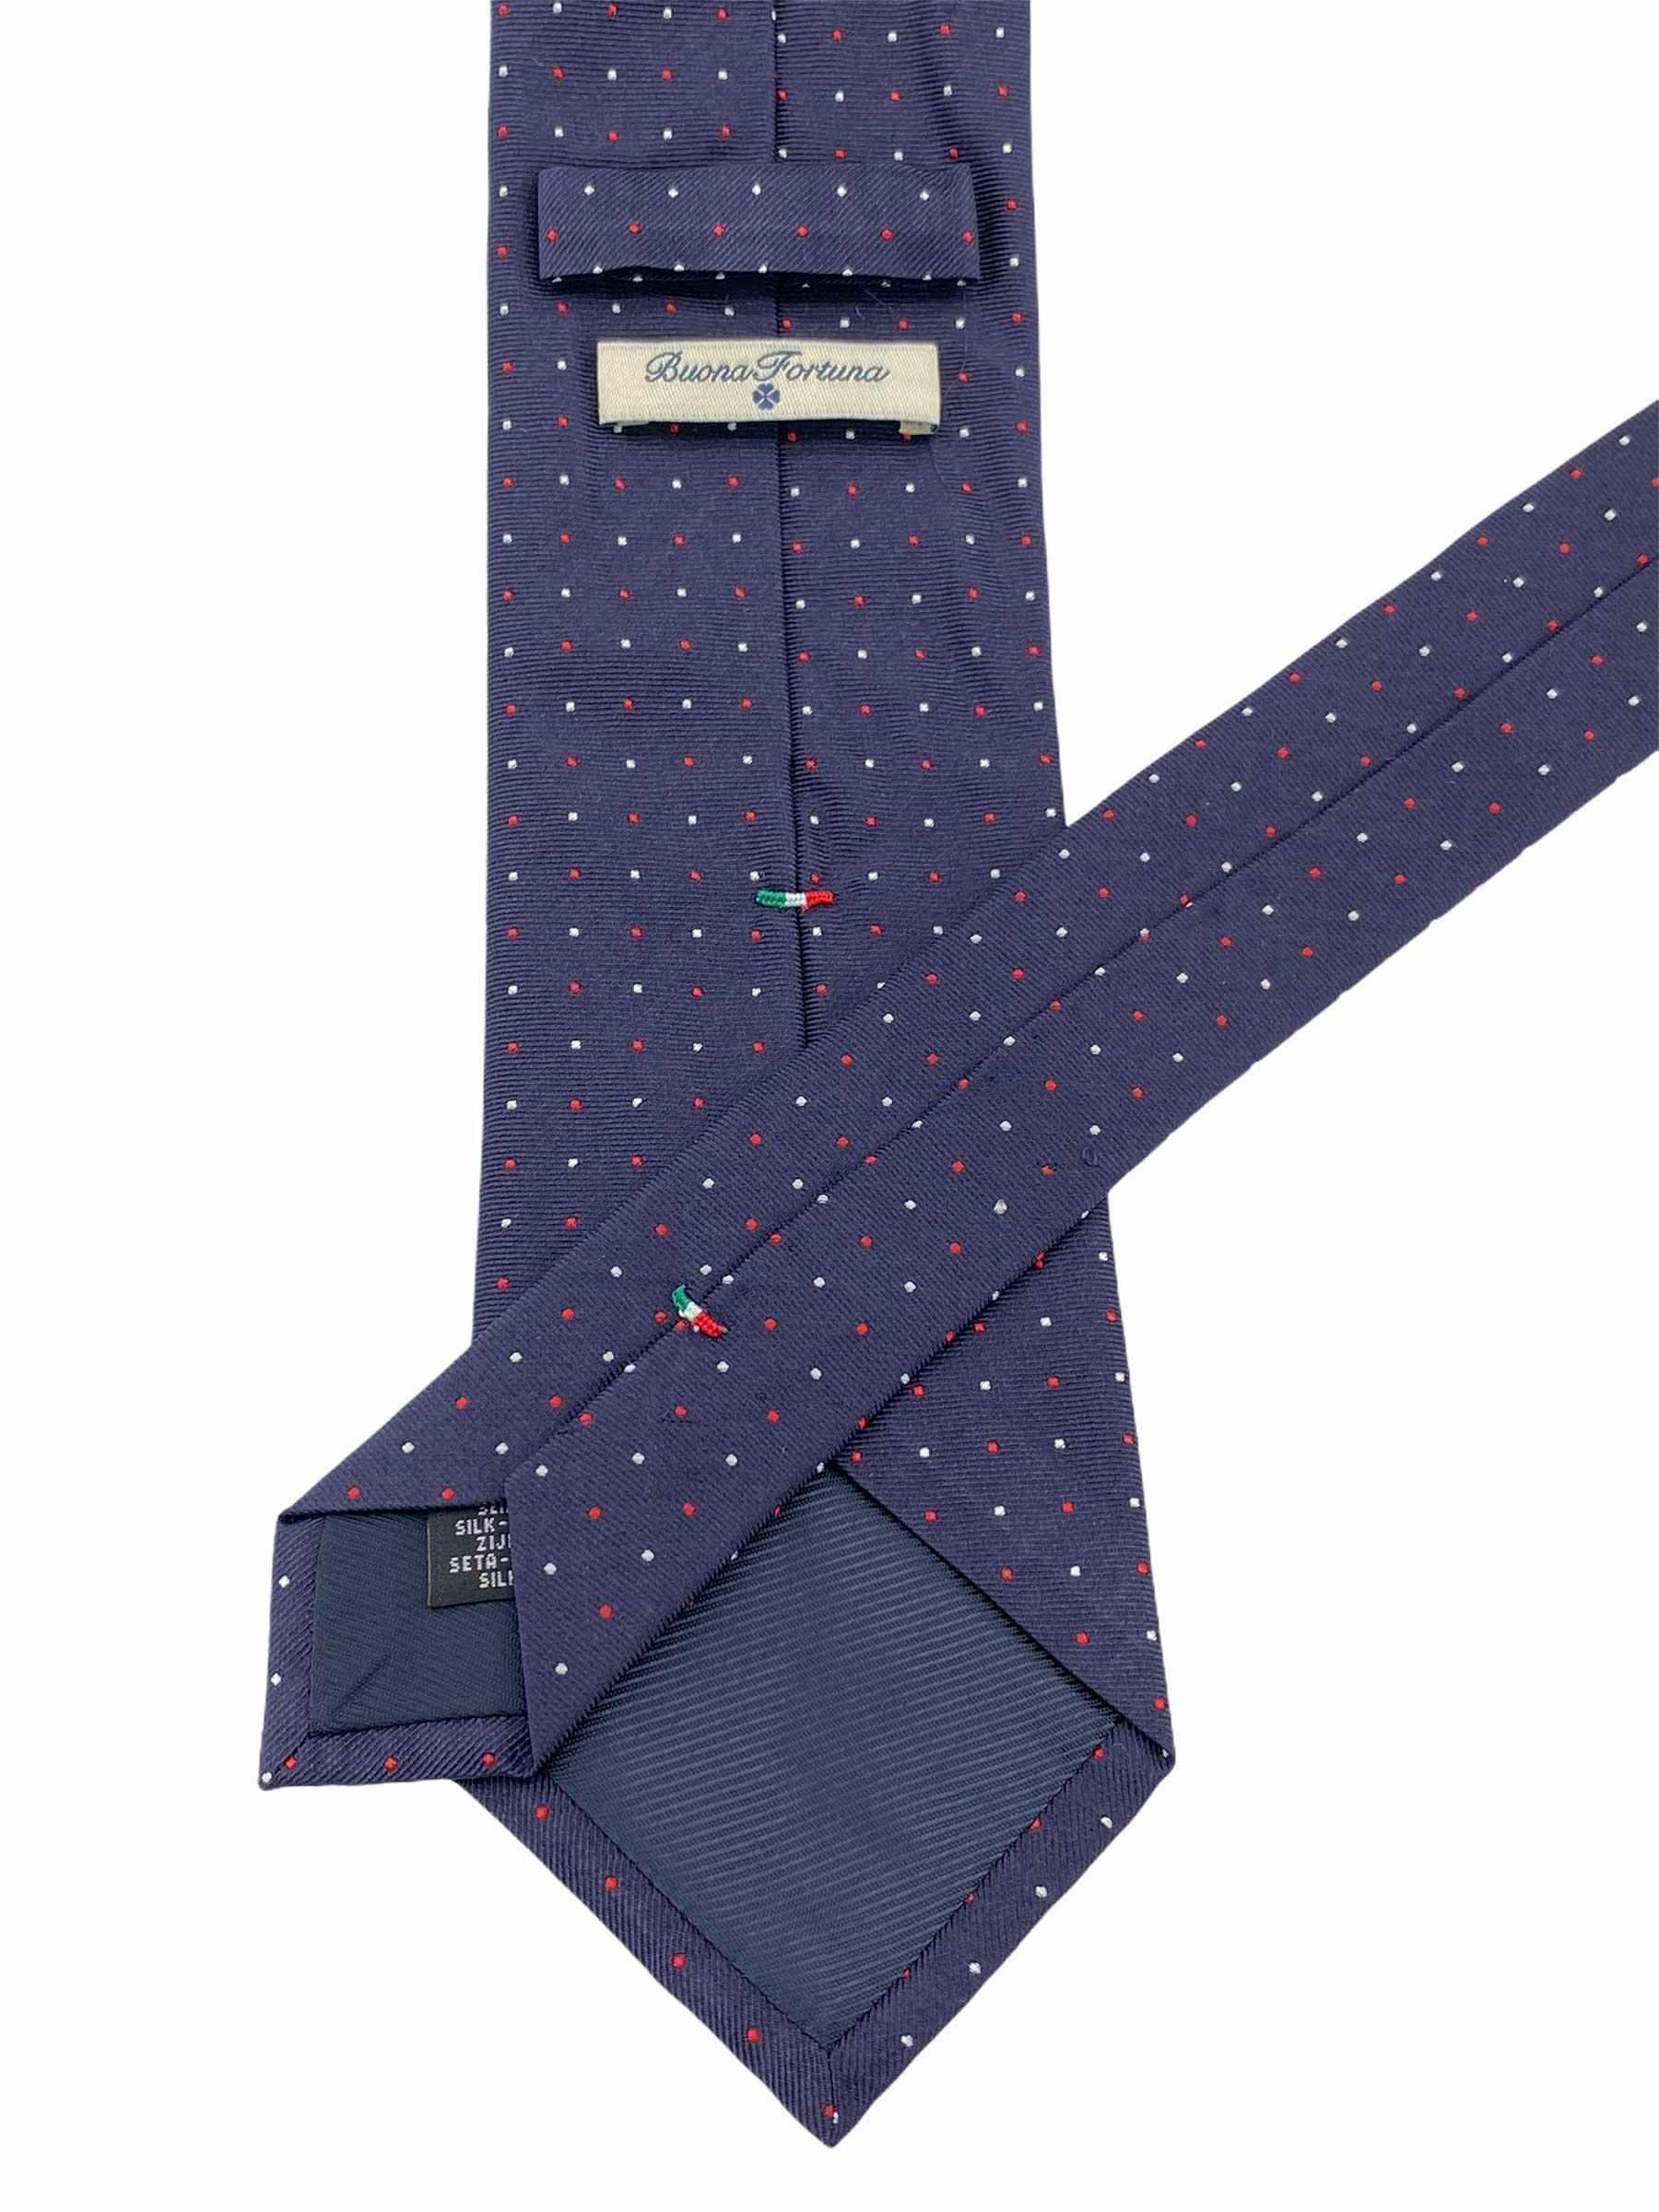 corbata tejida jacquard buona fortuna comprar online corbatas italianas exclusivas shop topos azul marino